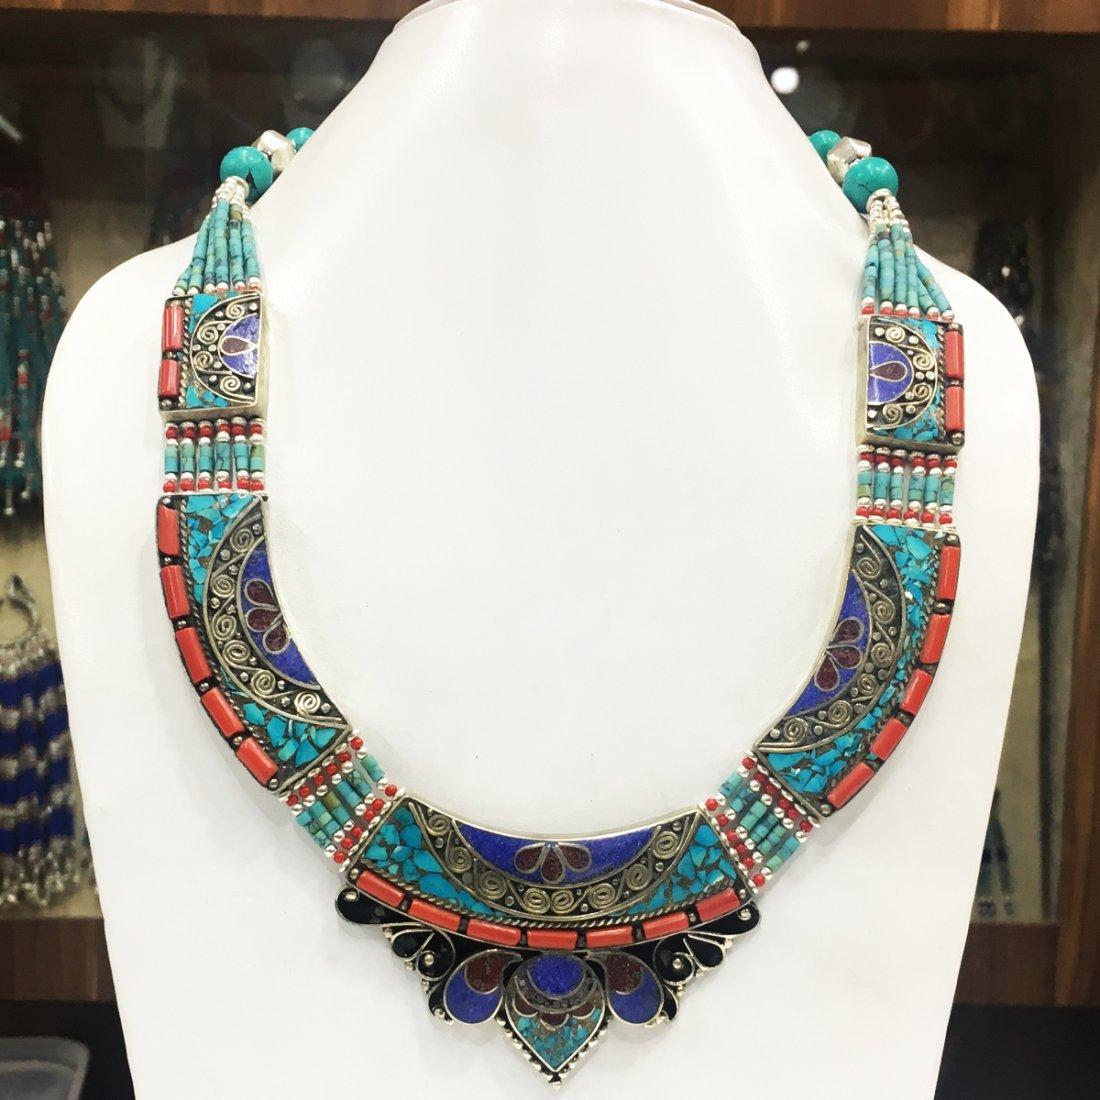 Buddhist Turquoise Handmade Vintage Necklace